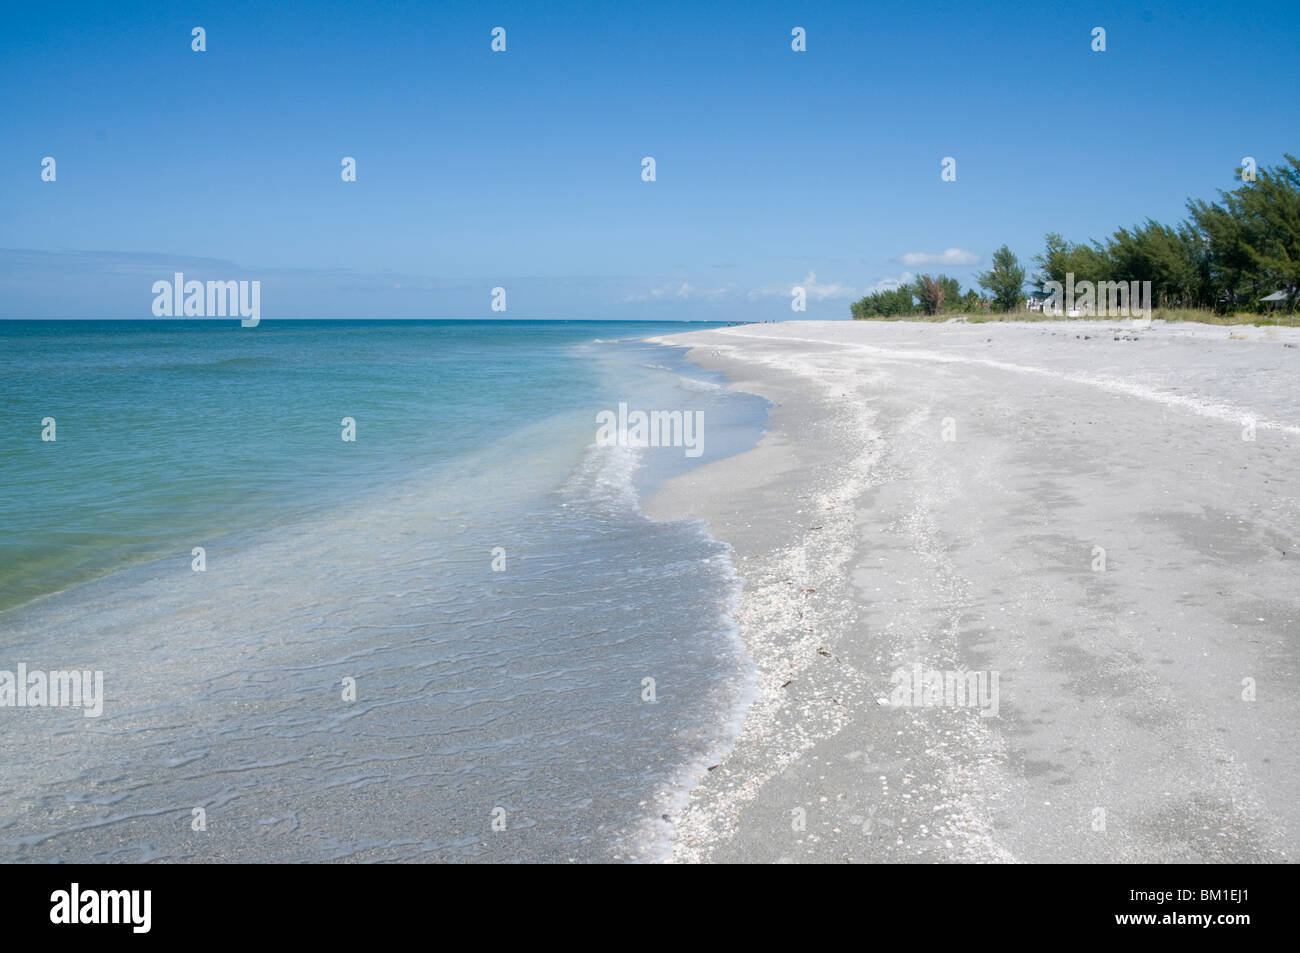 Playa cubierto de conchas, Captiva Island, Gulf Coast, Florida, Estados Unidos de América, América del Imagen De Stock